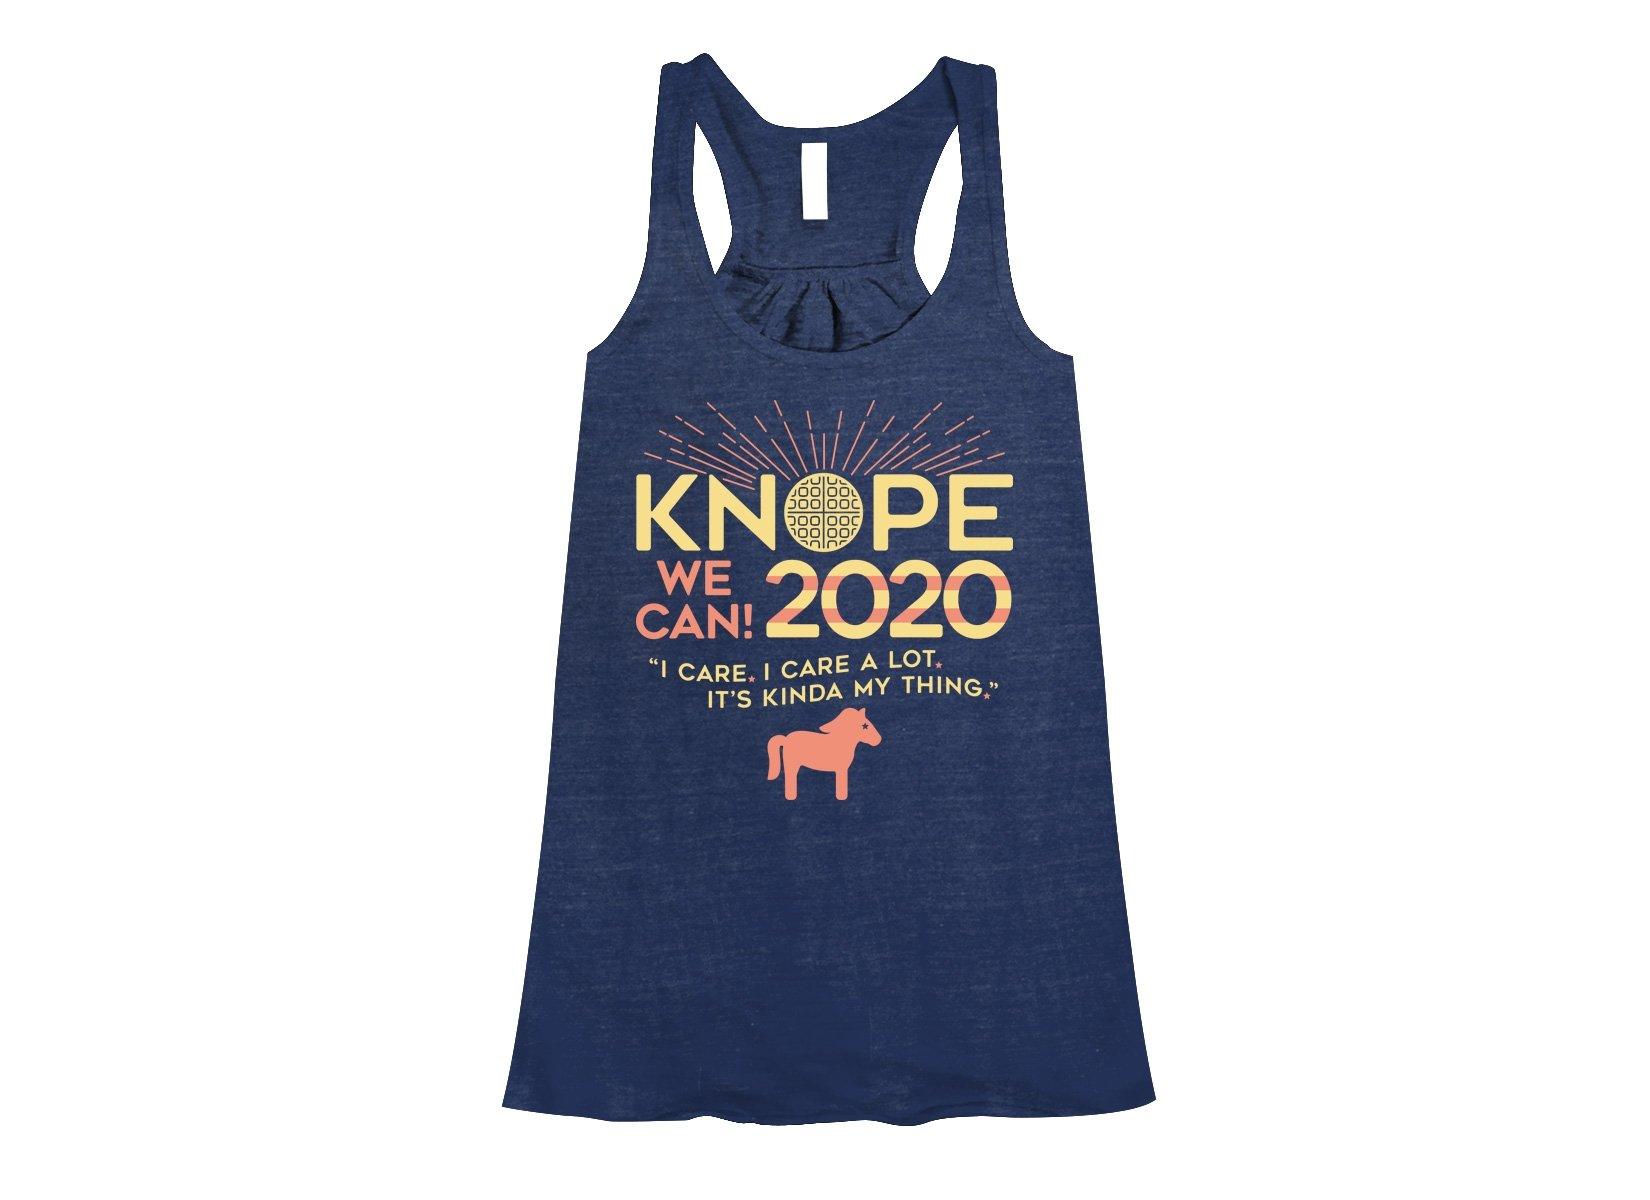 Knope 2020 on Womens Tanks T-Shirt